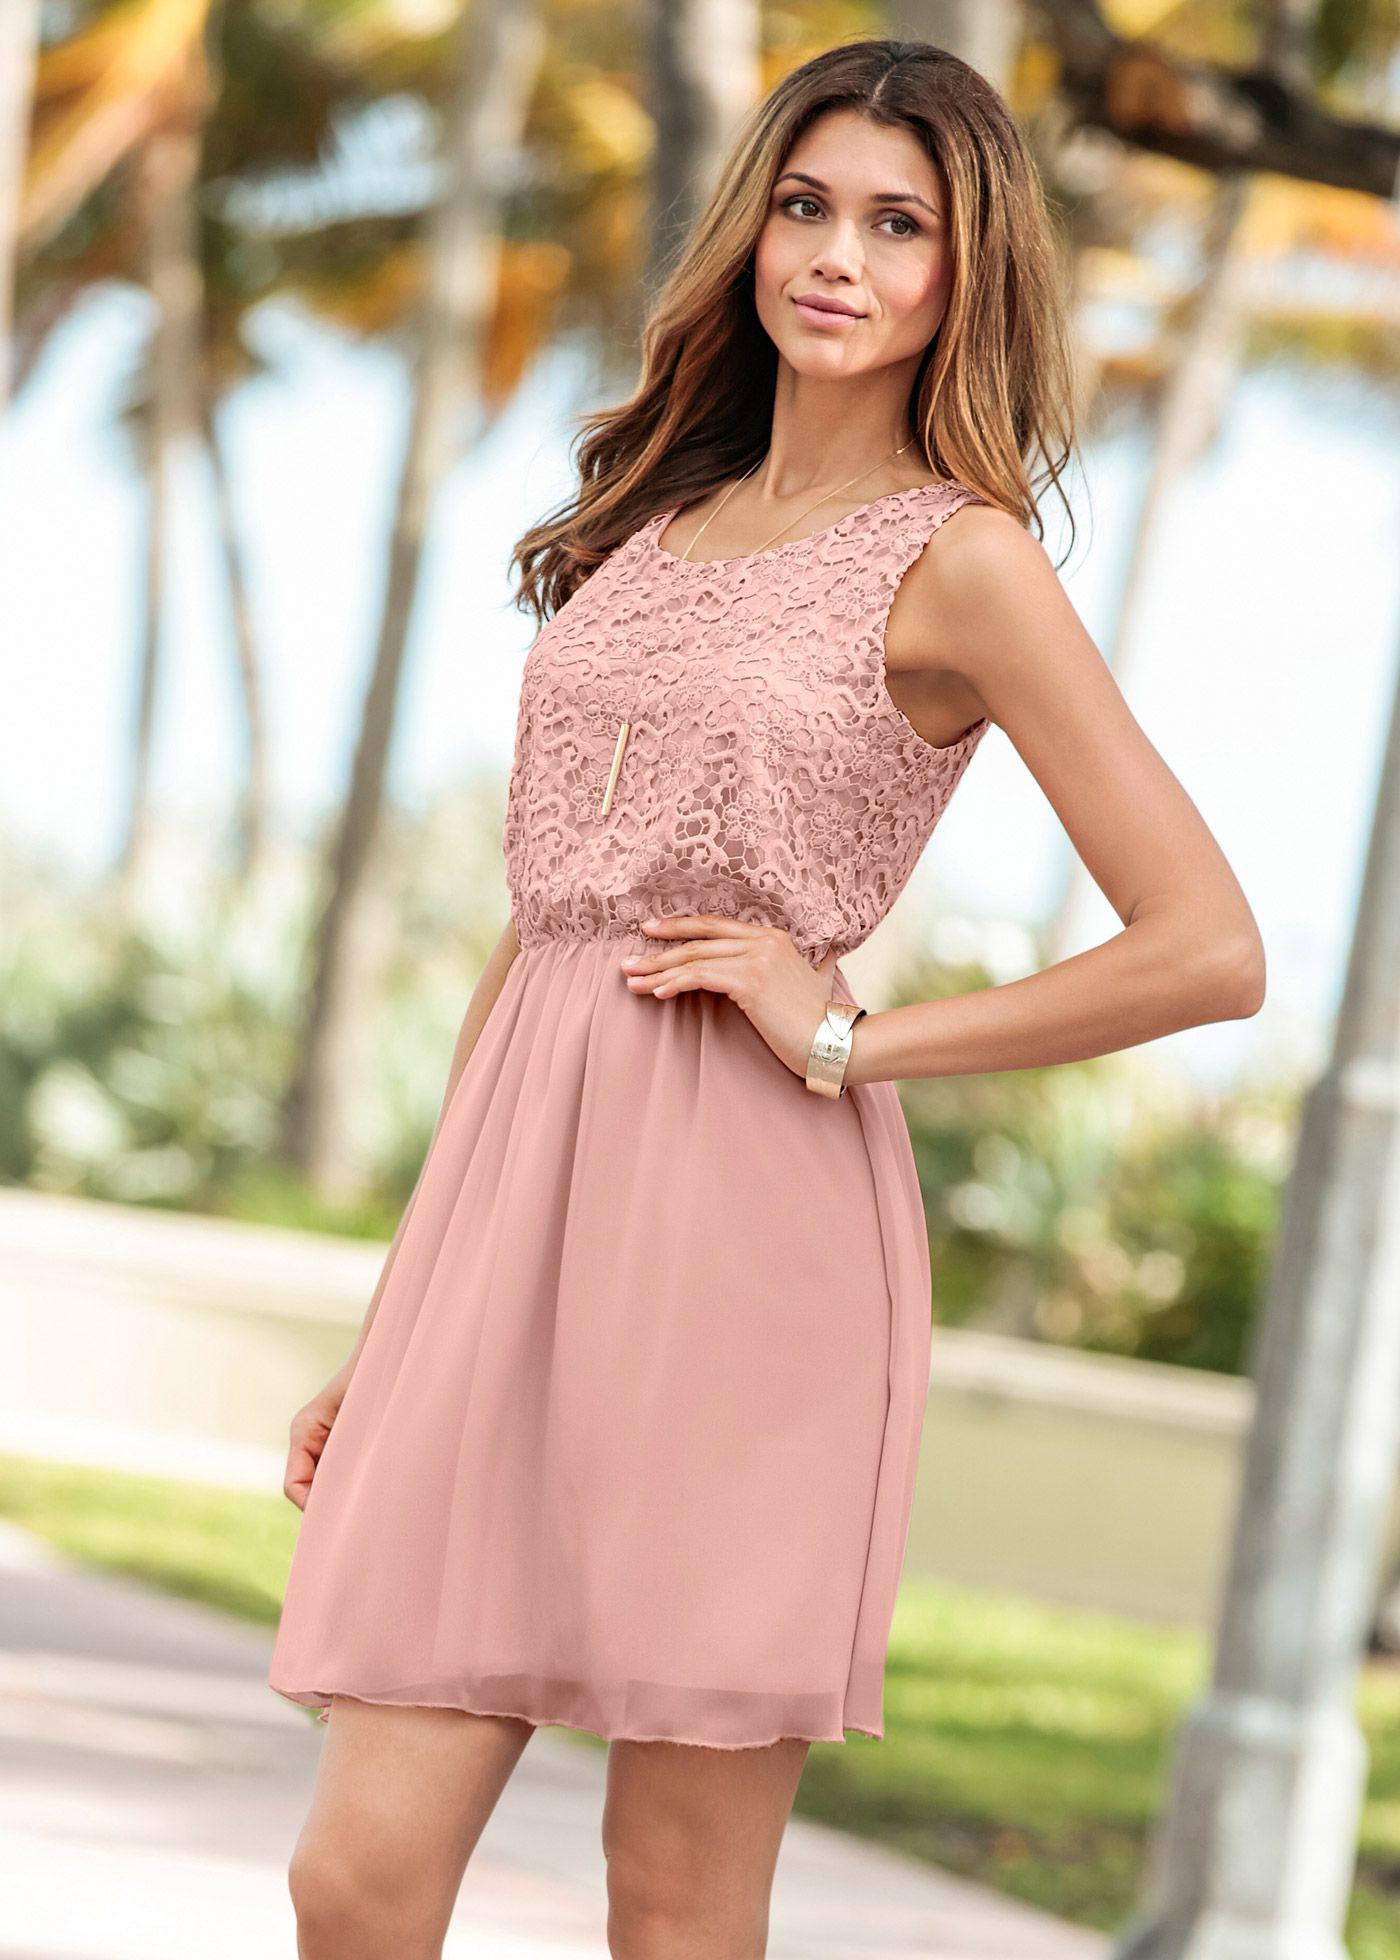 b69d21ca851237 Kleid vintagerosa - BODYFLIRT jetzt im Online Shop von bonprix.de ab ? 33,